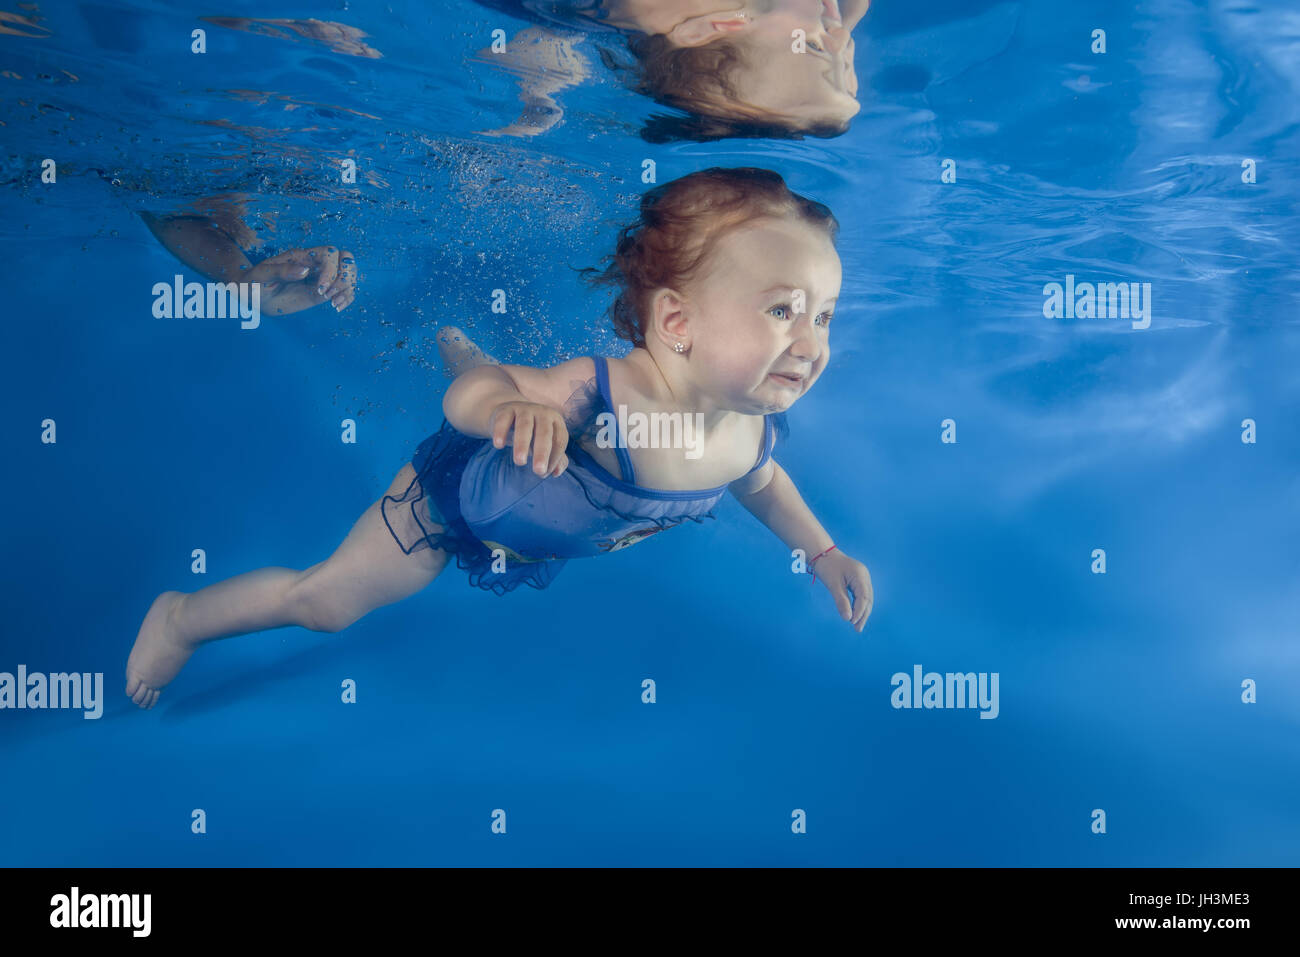 Afraid Water Swimming Pool Stock Photos Afraid Water Swimming Pool Stock Images Alamy